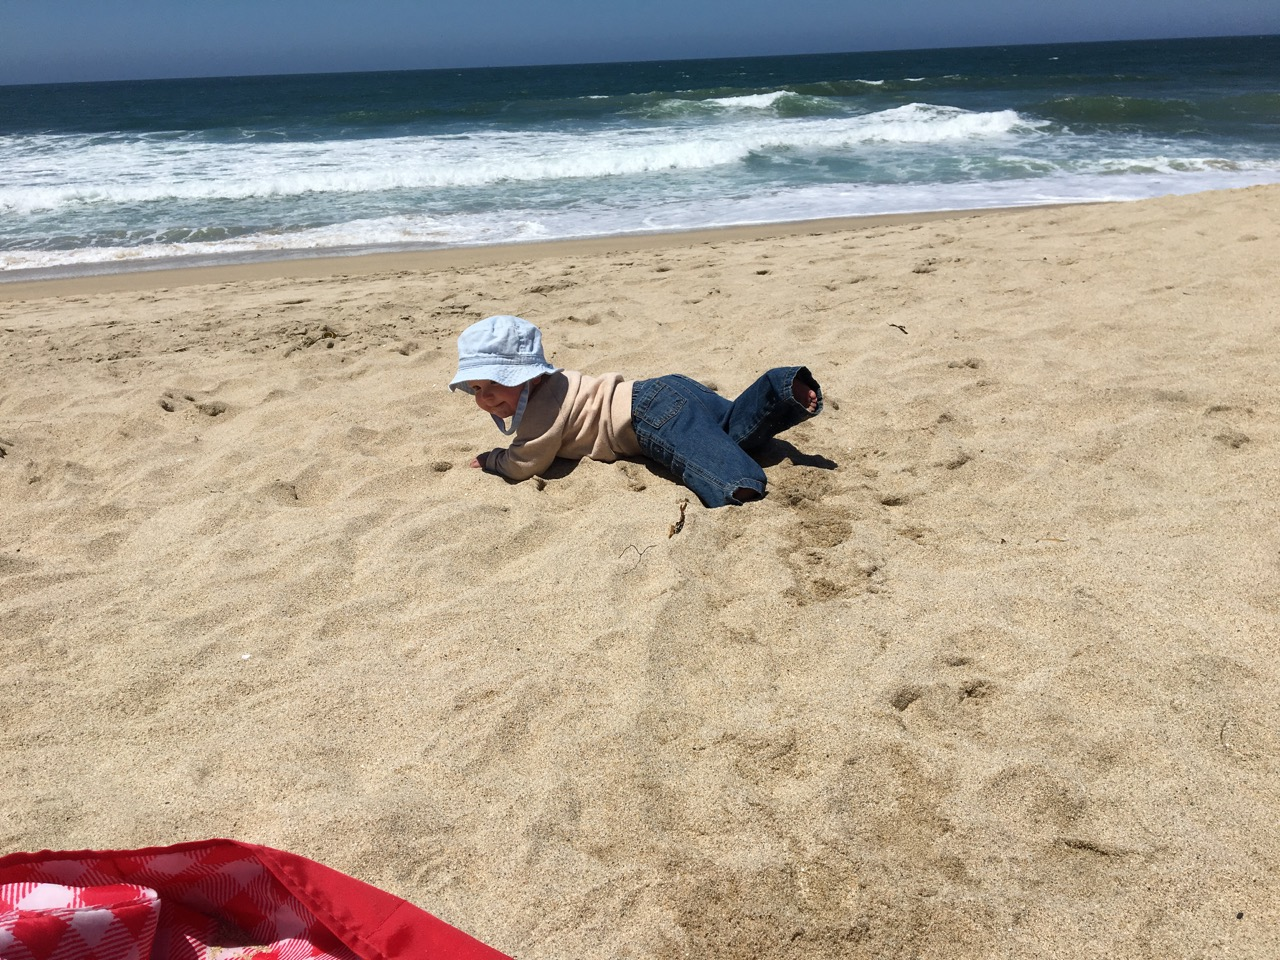 Running away at the beach